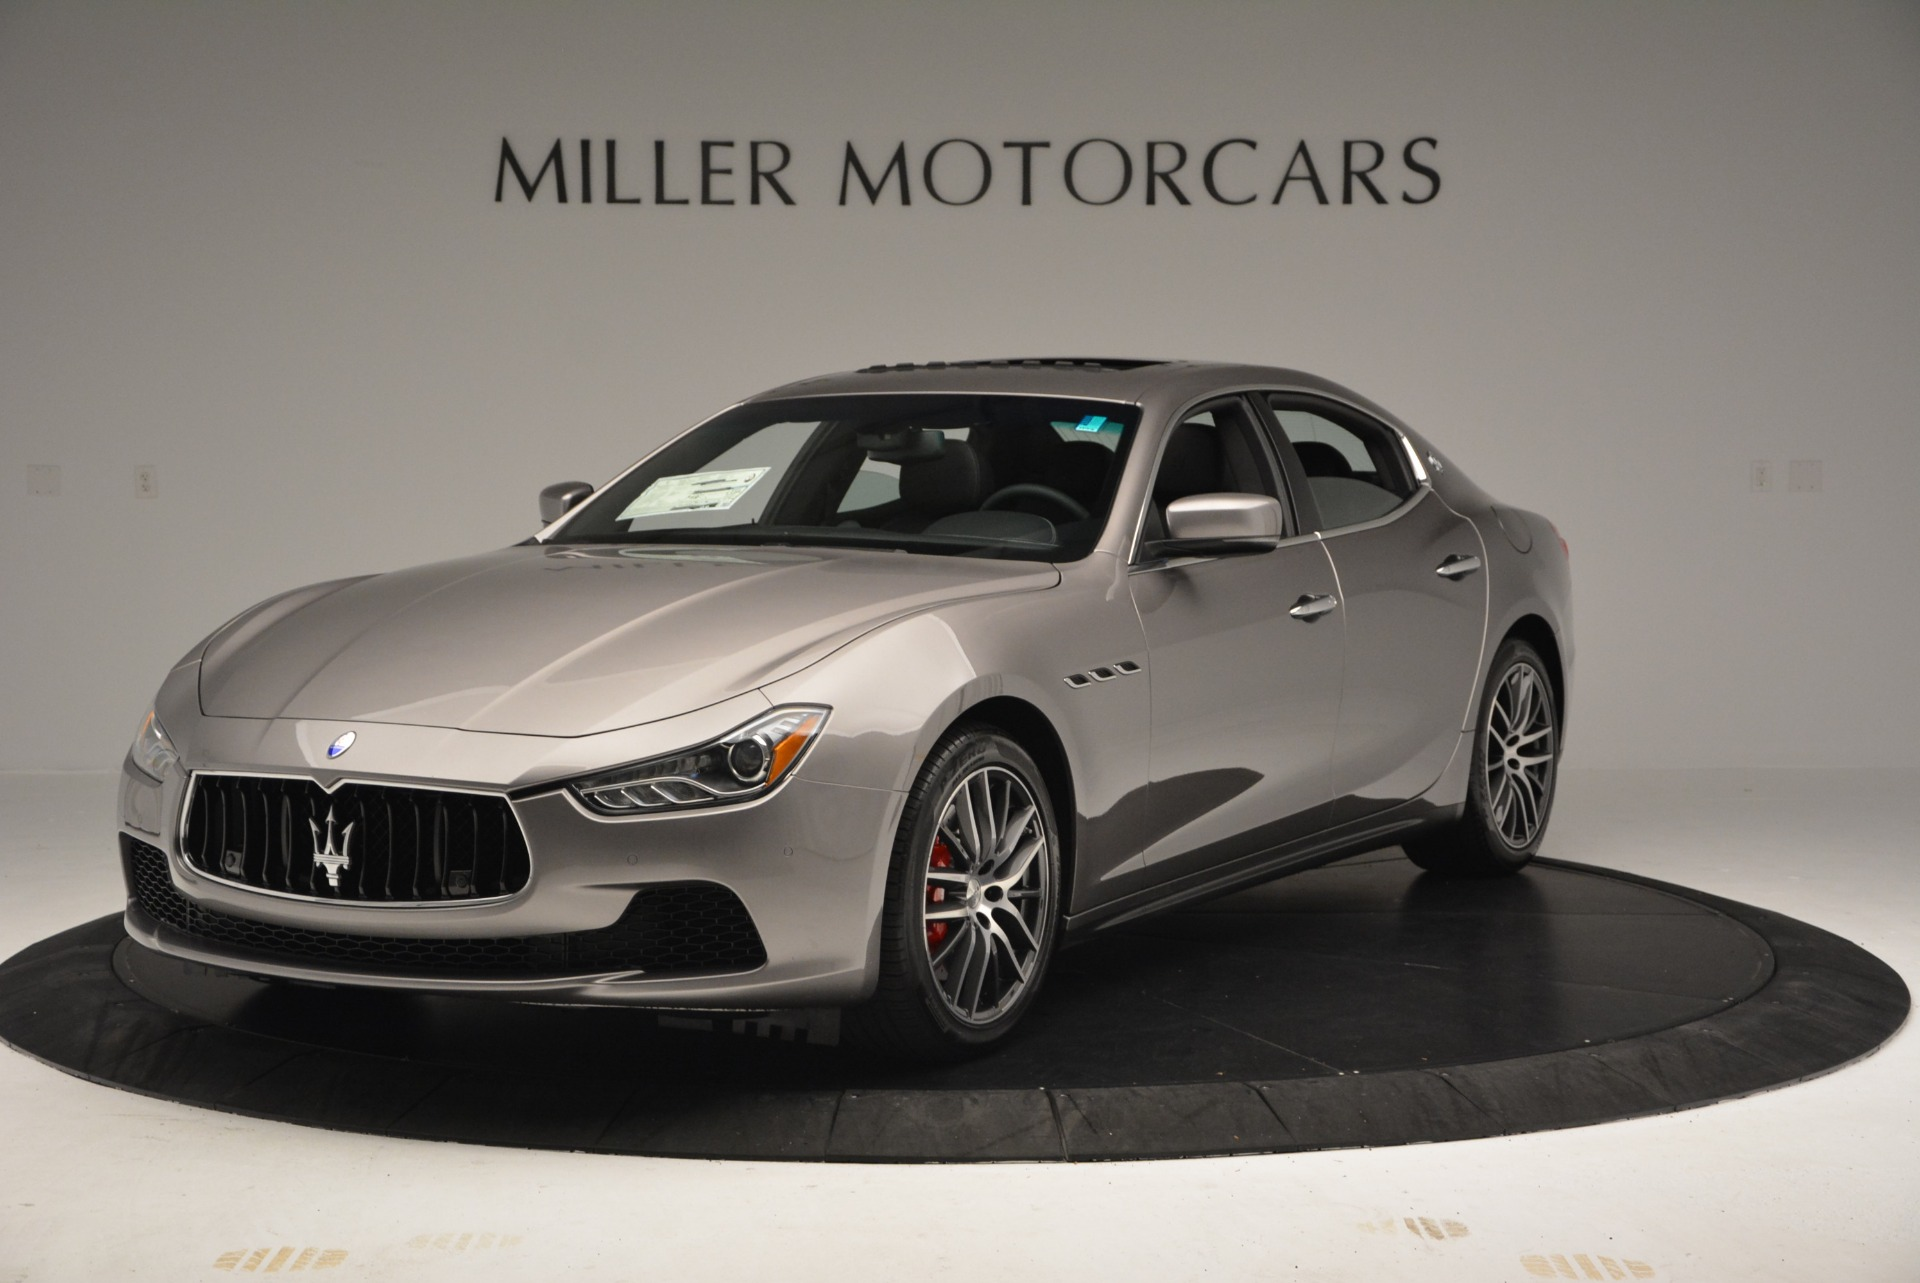 New 2017 Maserati Ghibli S Q4 For Sale In Greenwich, CT 920_main